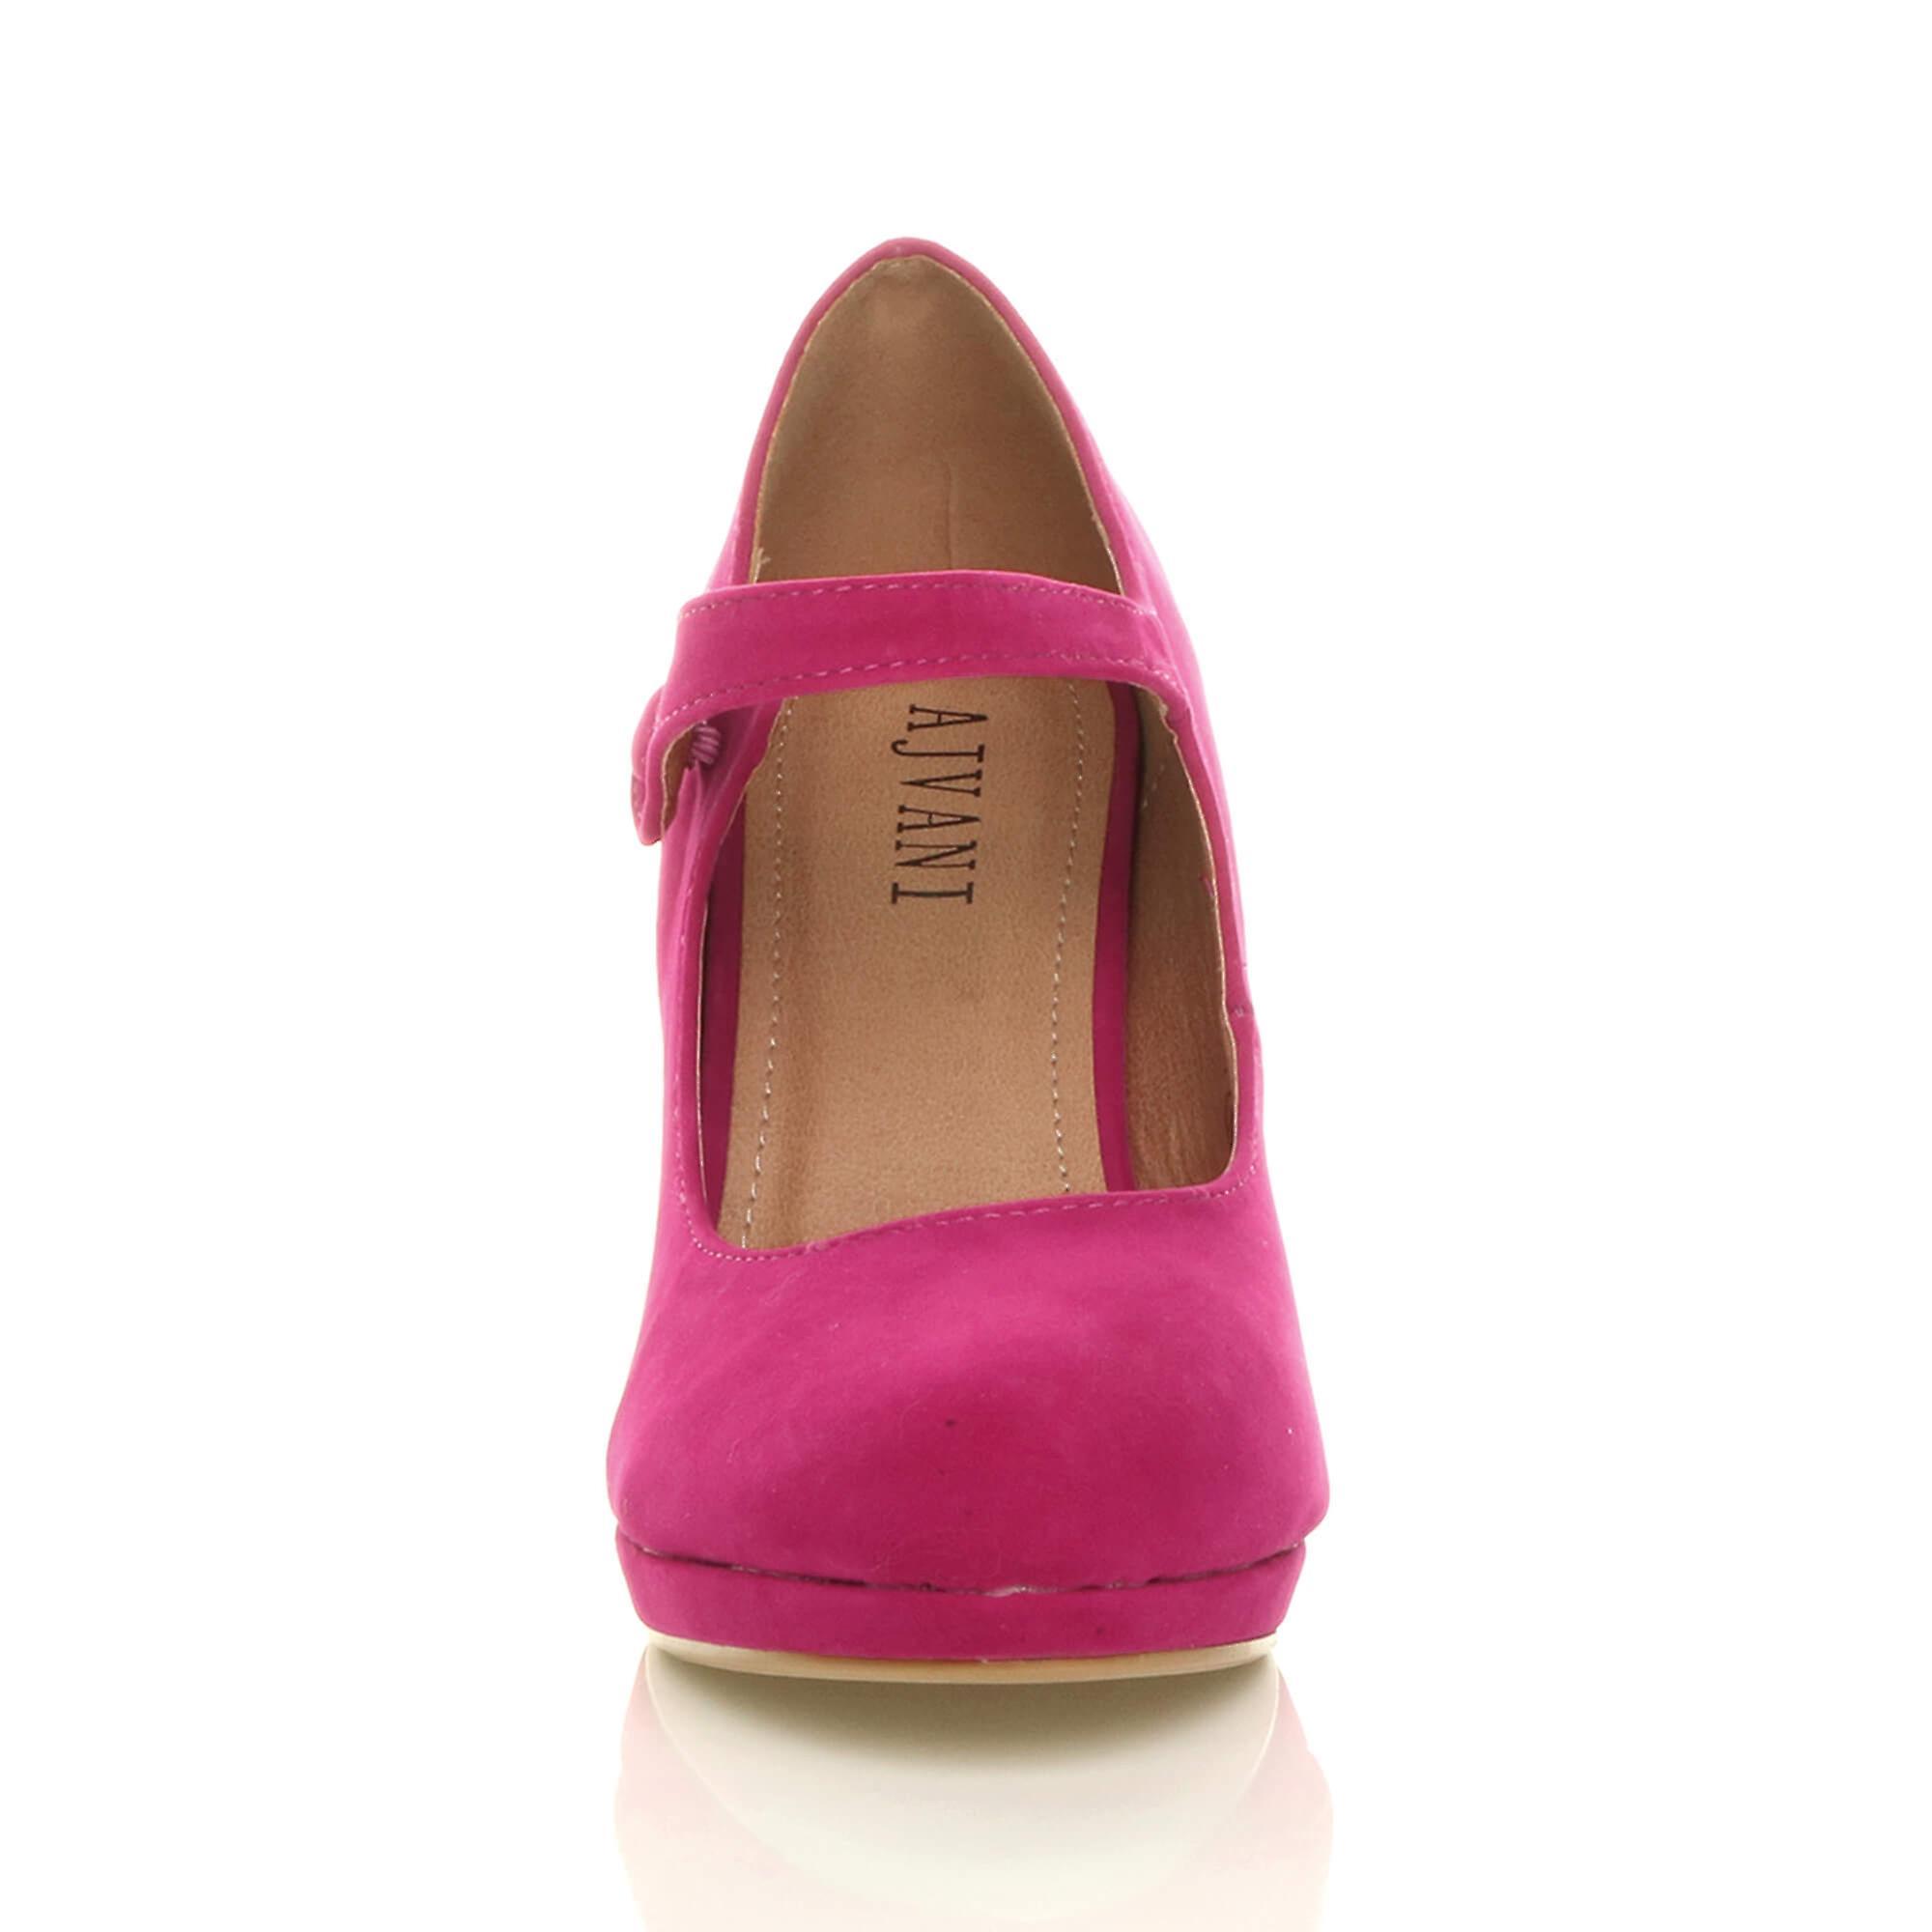 Ajvani womens mid high heel mary jane jane jane evening work platform court shoes e1ee63